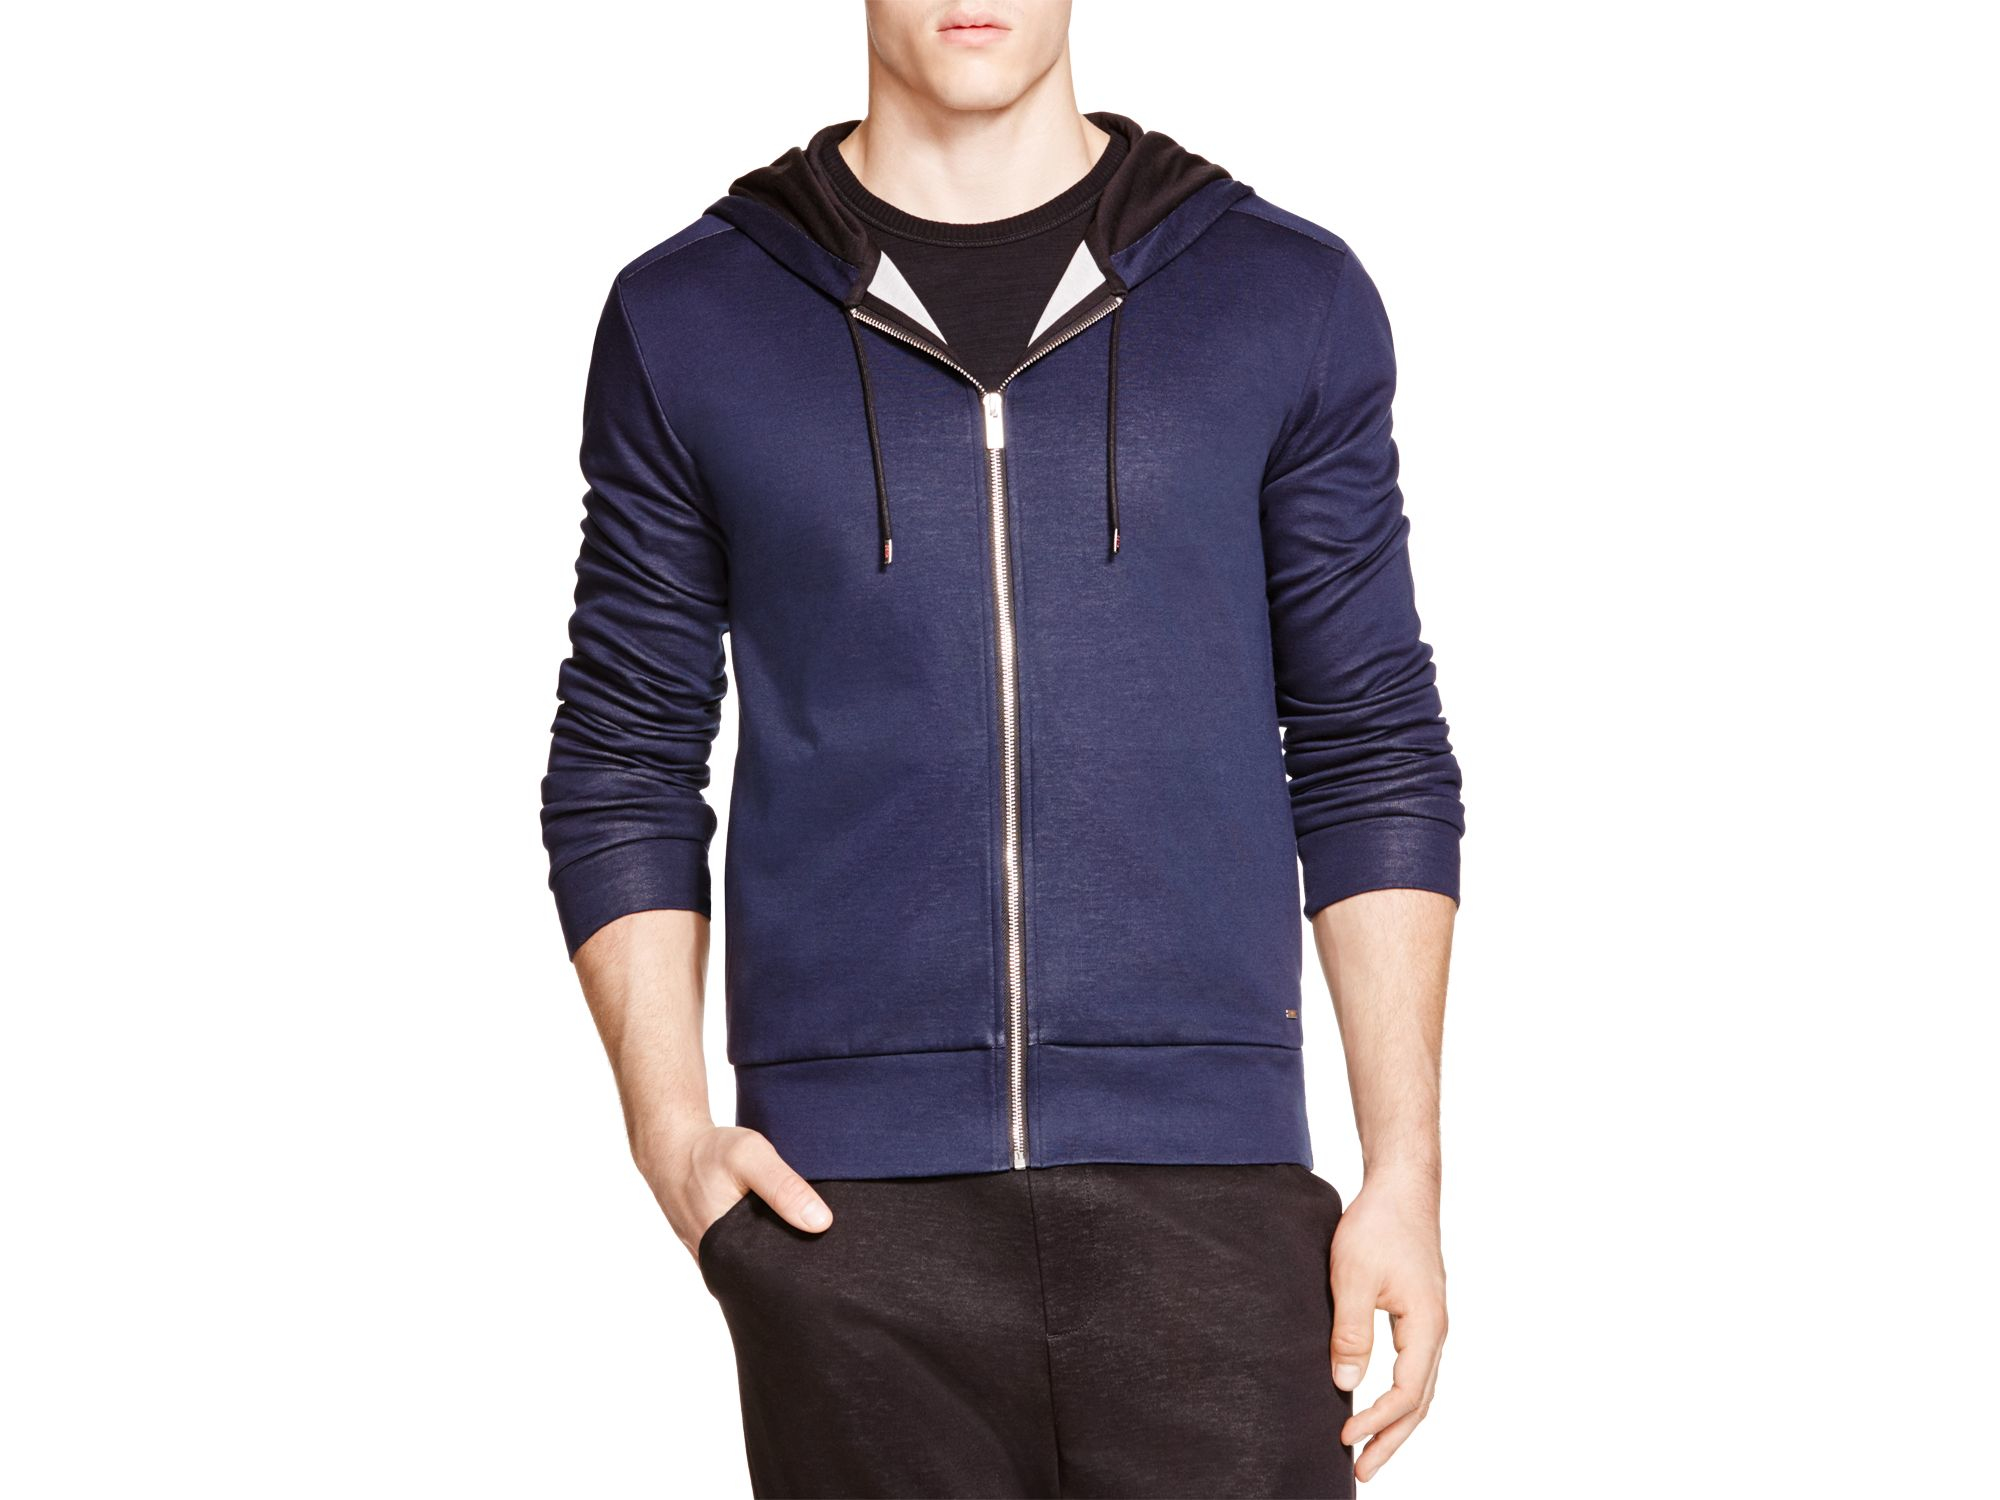 rocky 5 hugo boss sweatshirt. Black Bedroom Furniture Sets. Home Design Ideas